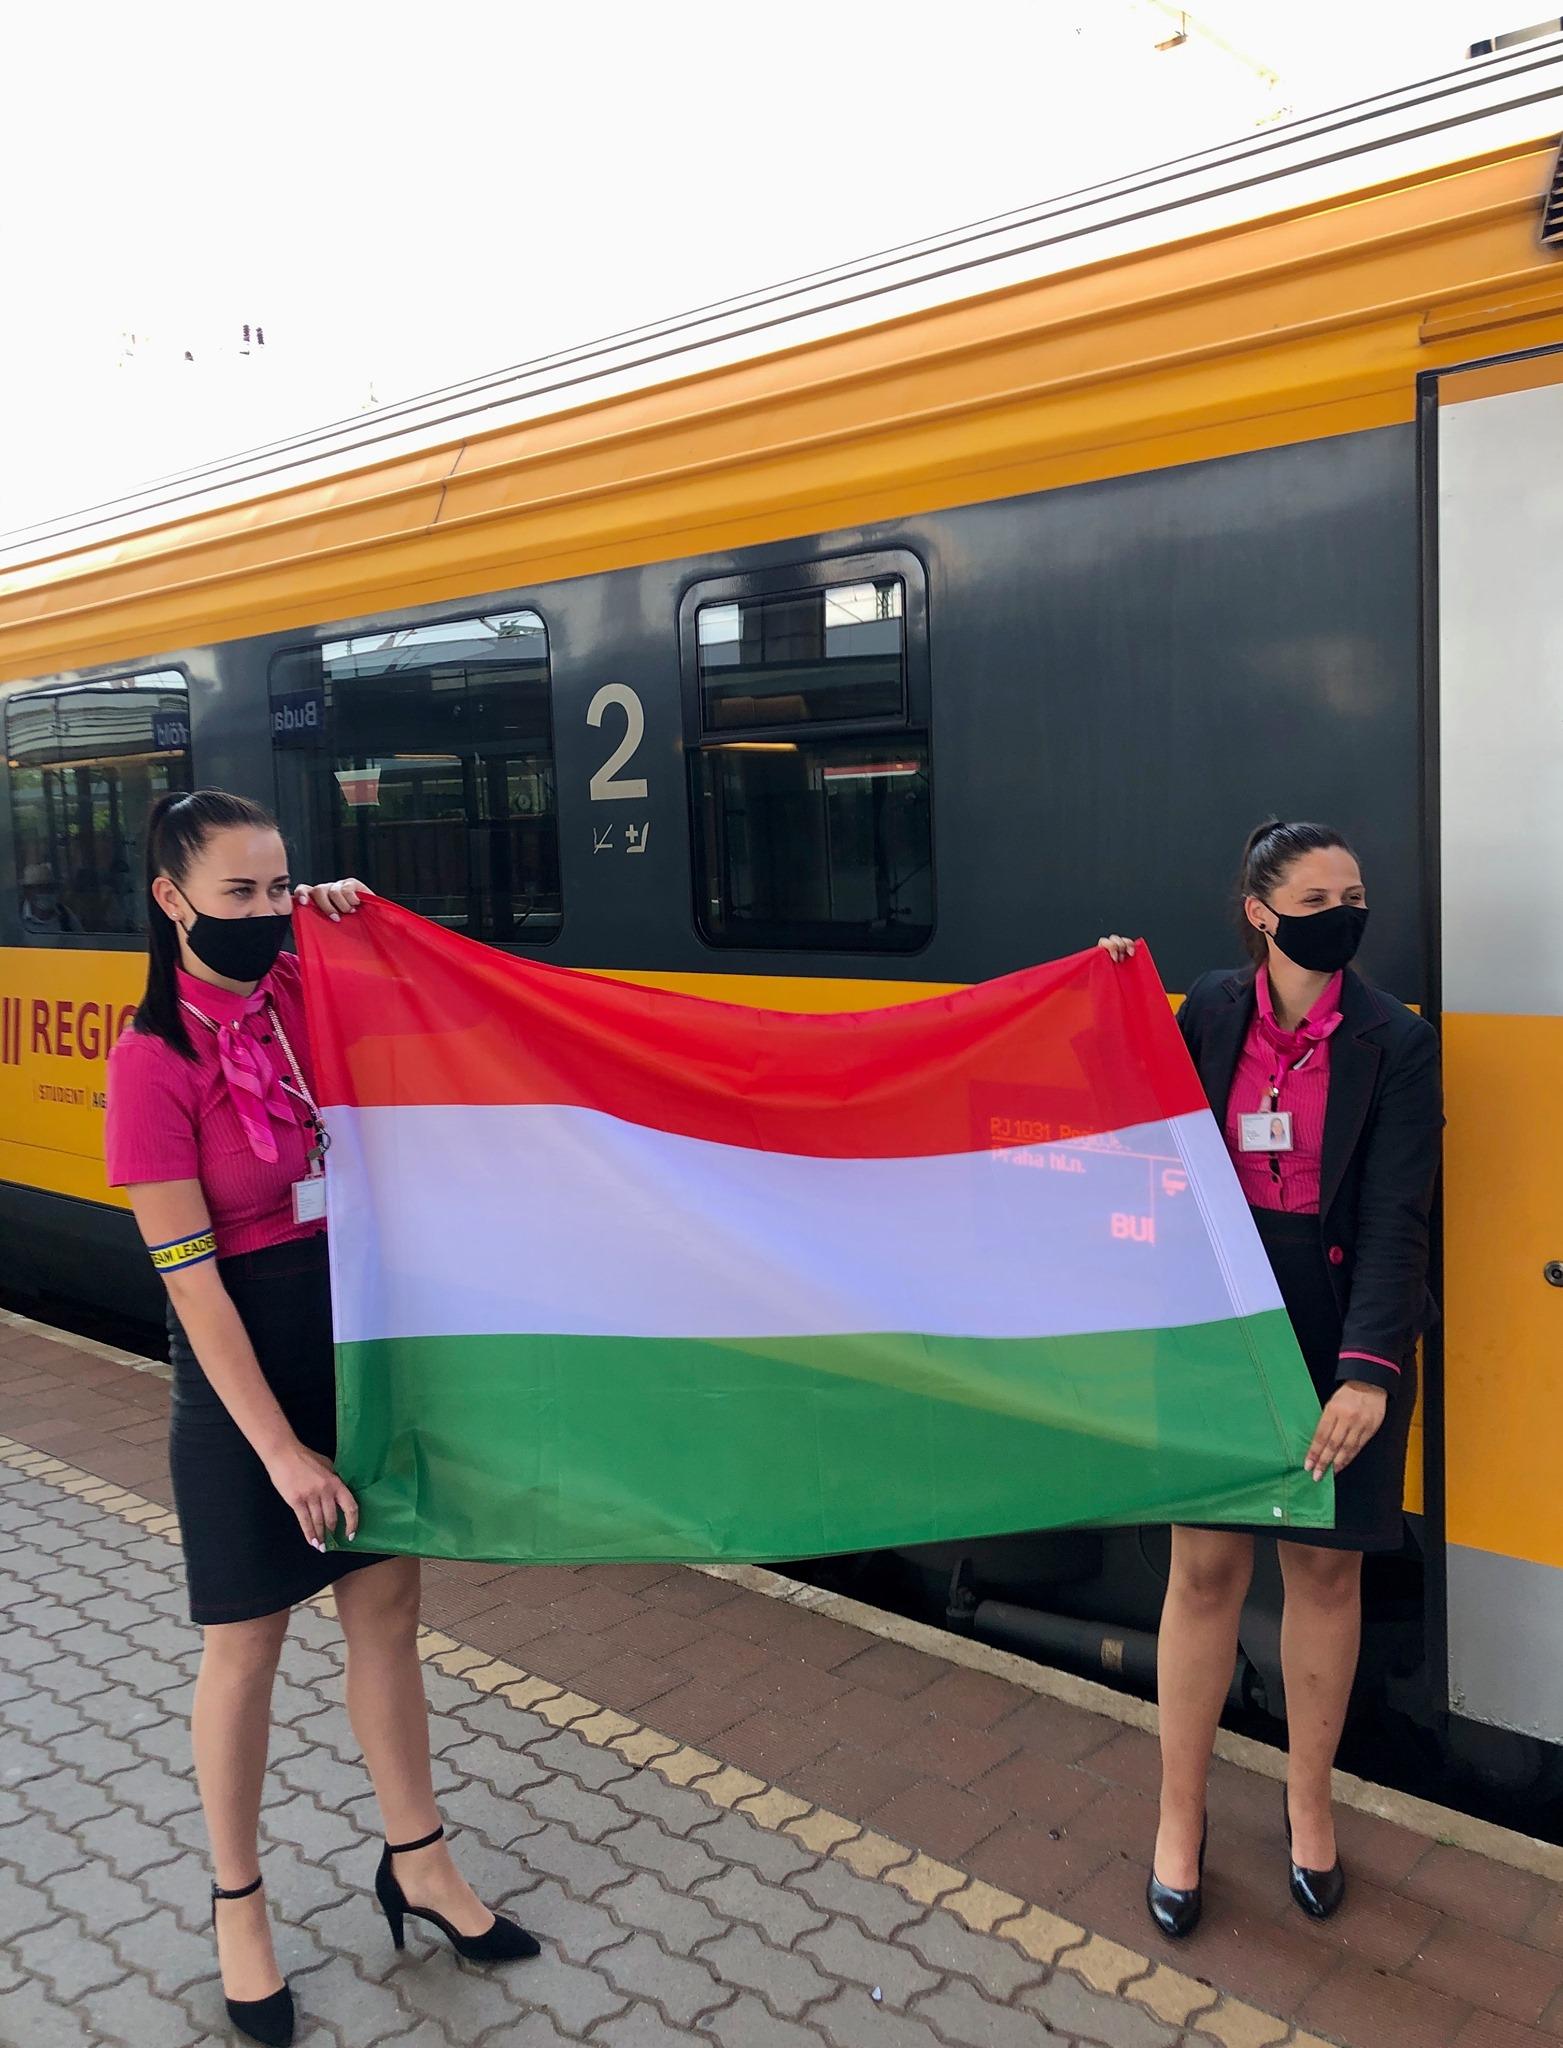 regiojet_magyar_zaszlo.jpg